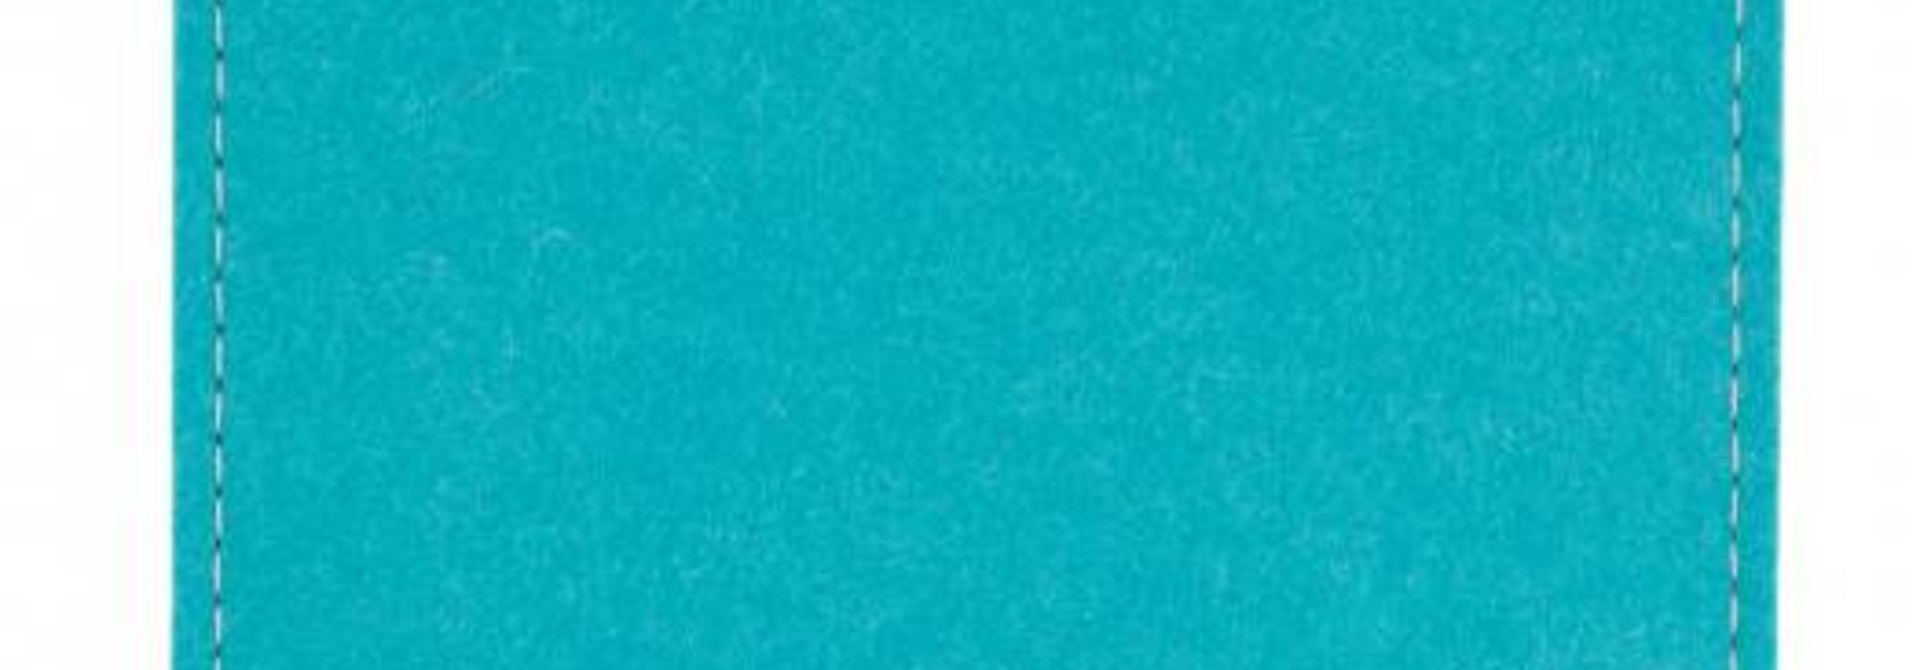 Magic Keyboard Sleeve Turquoise